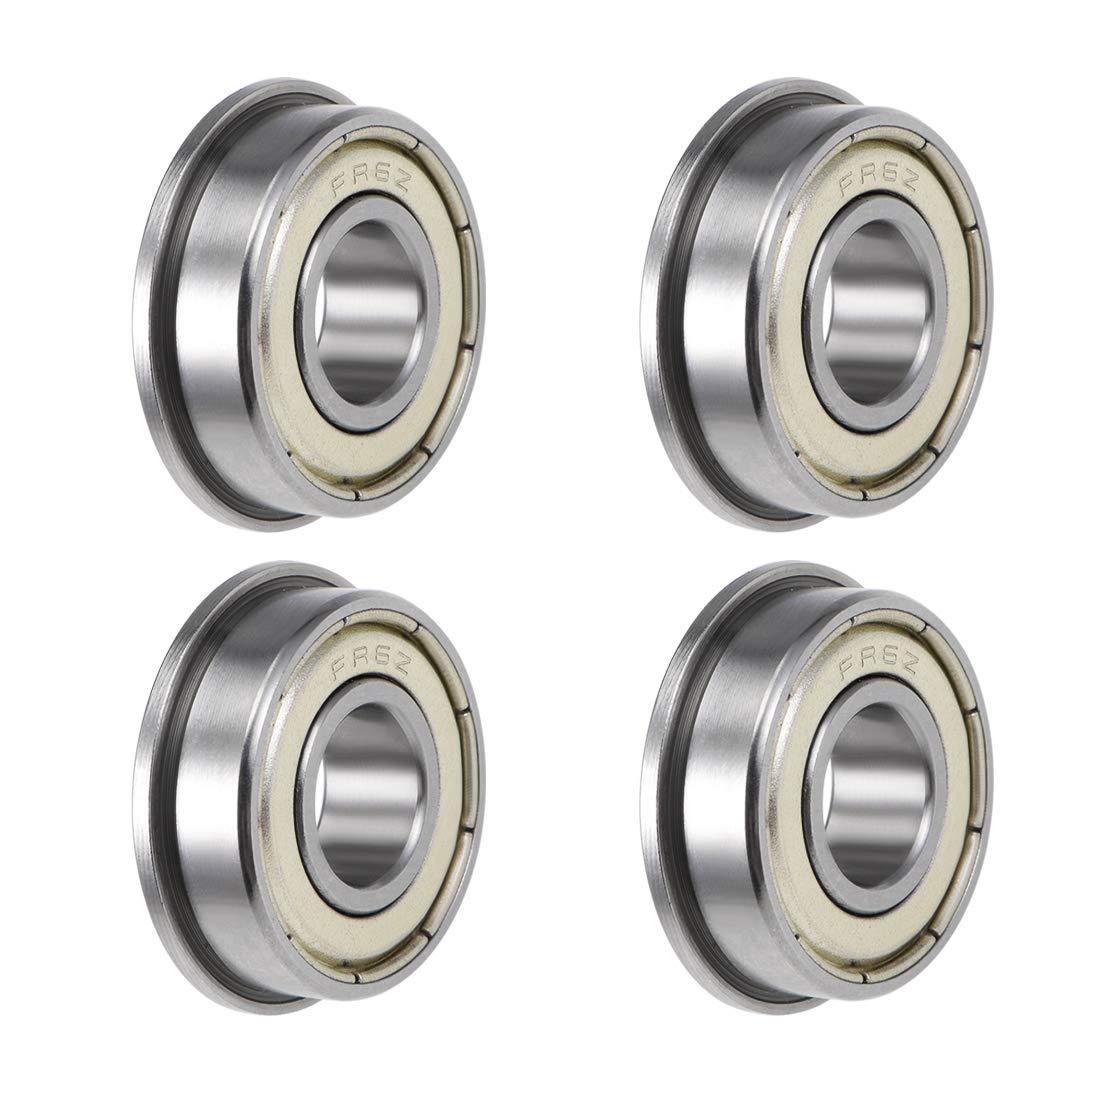 10 pcs R6 ZZ C3 metal shielded ball bearing 3//8x 7//8x 9//32 inch